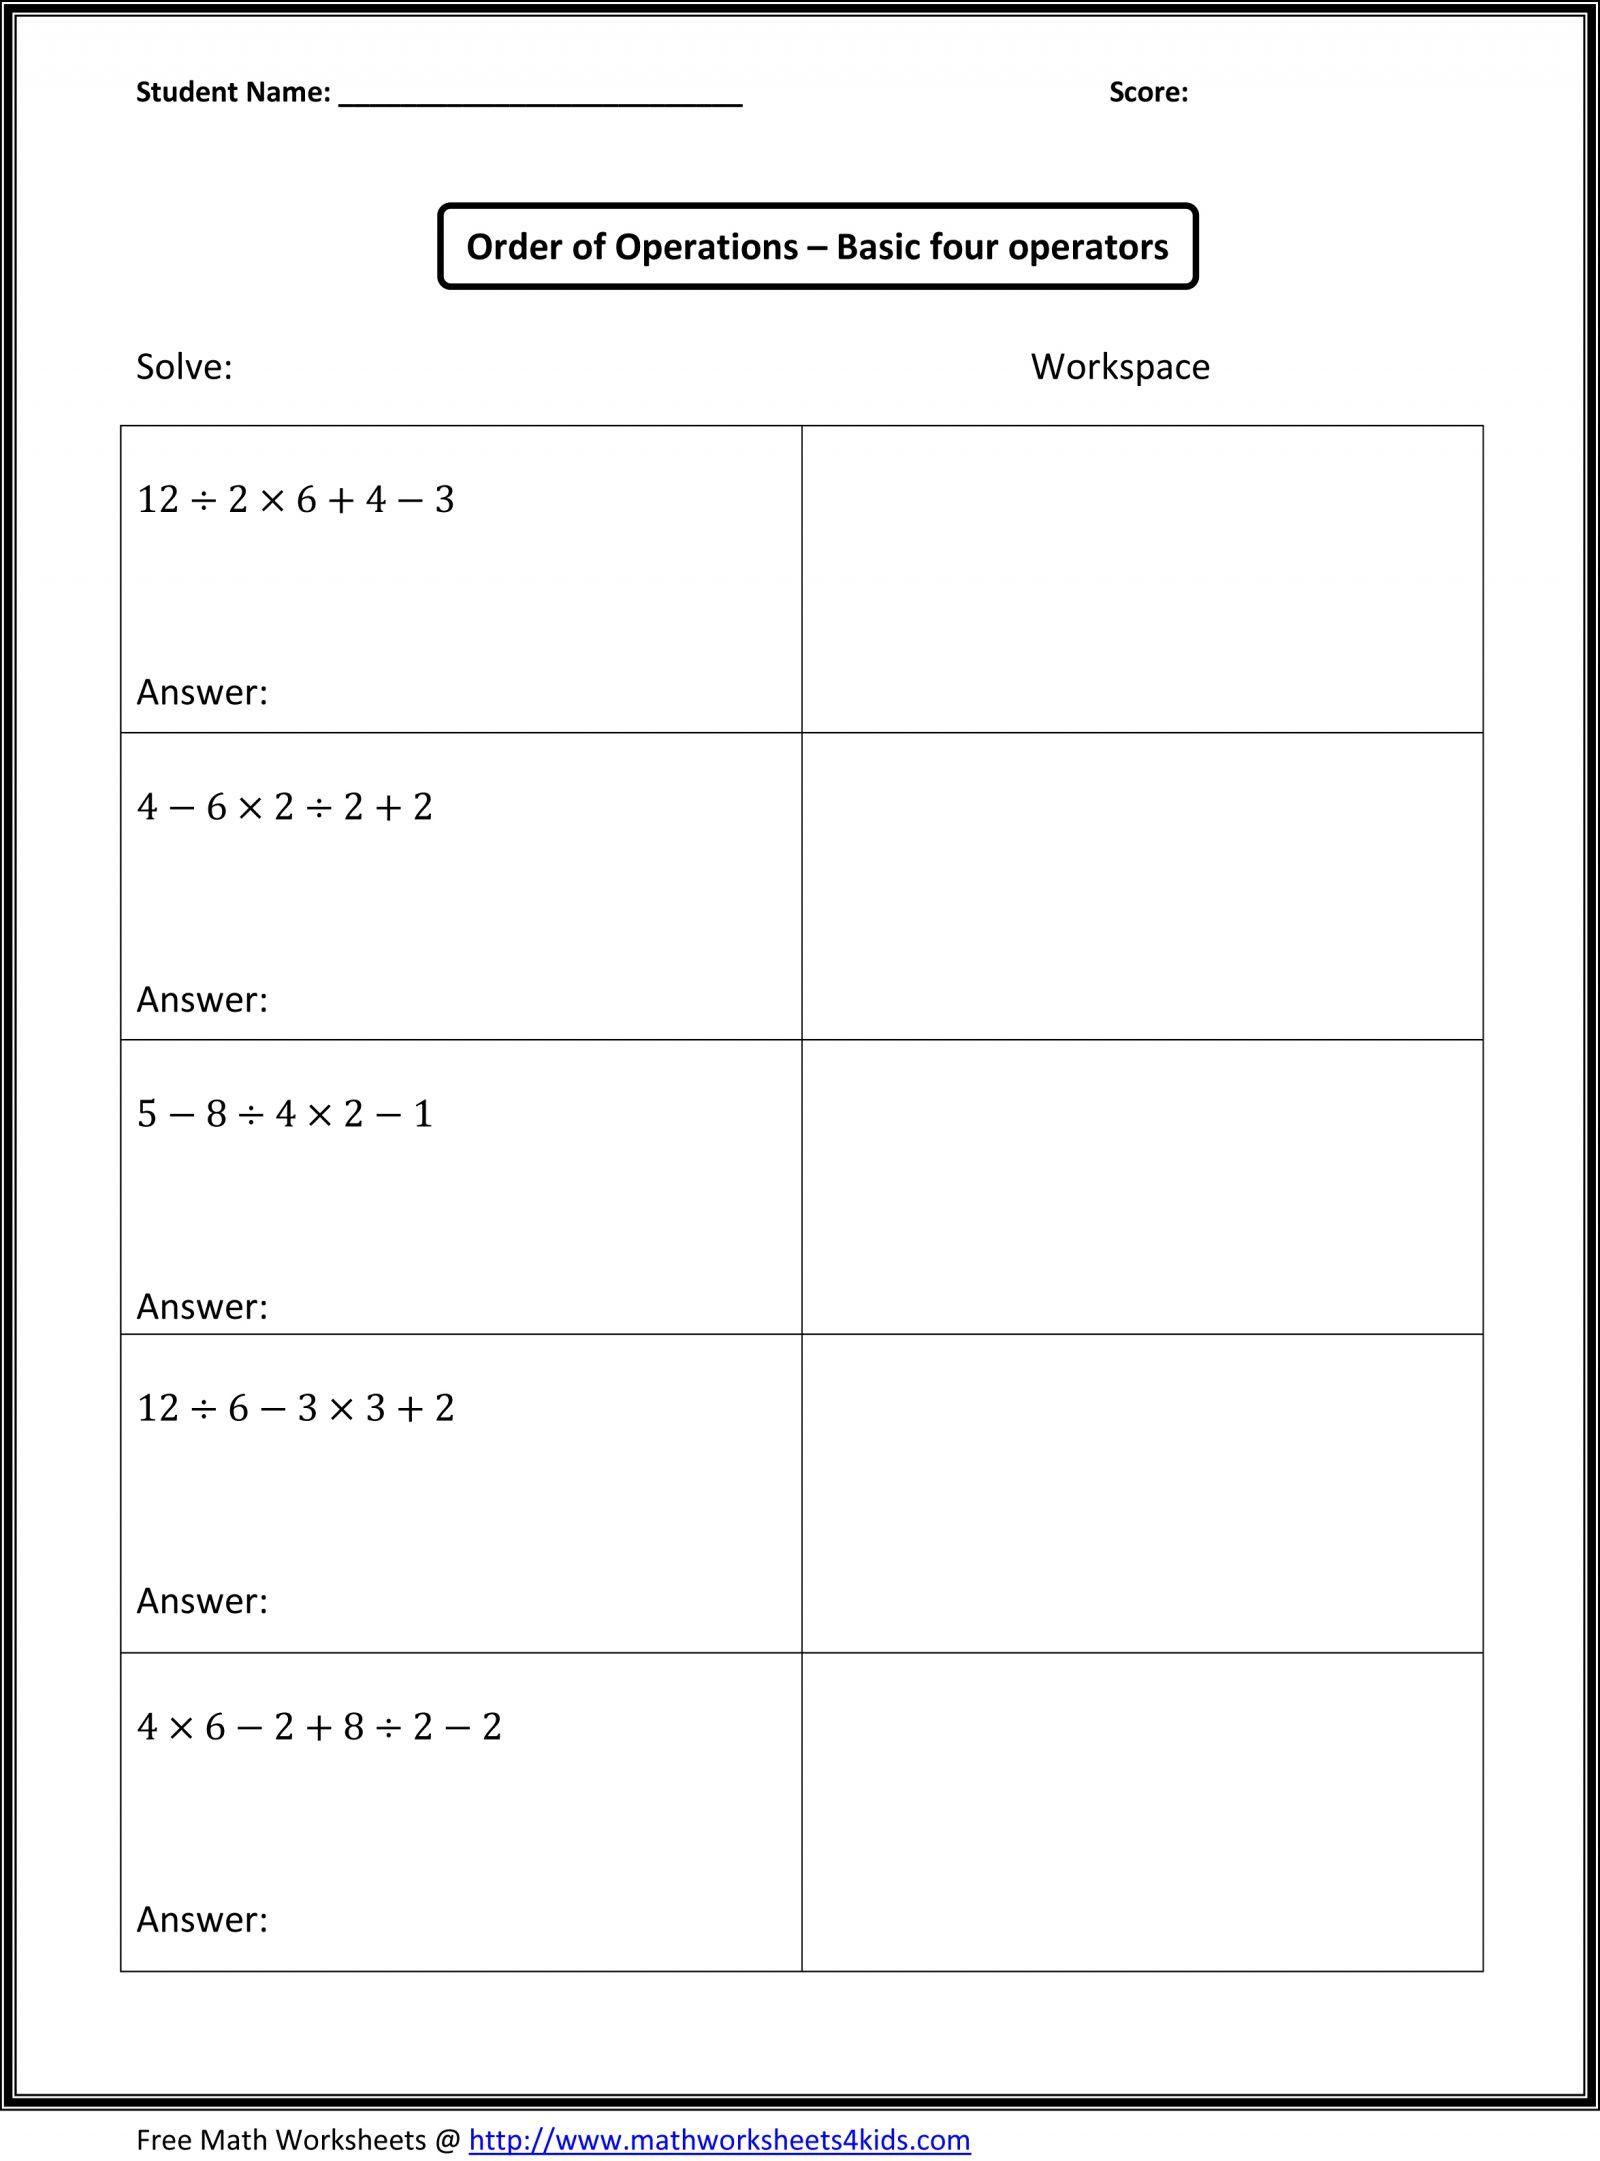 4 Free Math Worksheets Third Grade 3 Multiplication Multiplication Table 4 6 Math Worksheets Free Math Worksheets Algebra Worksheets 4th Grade Math Worksheets